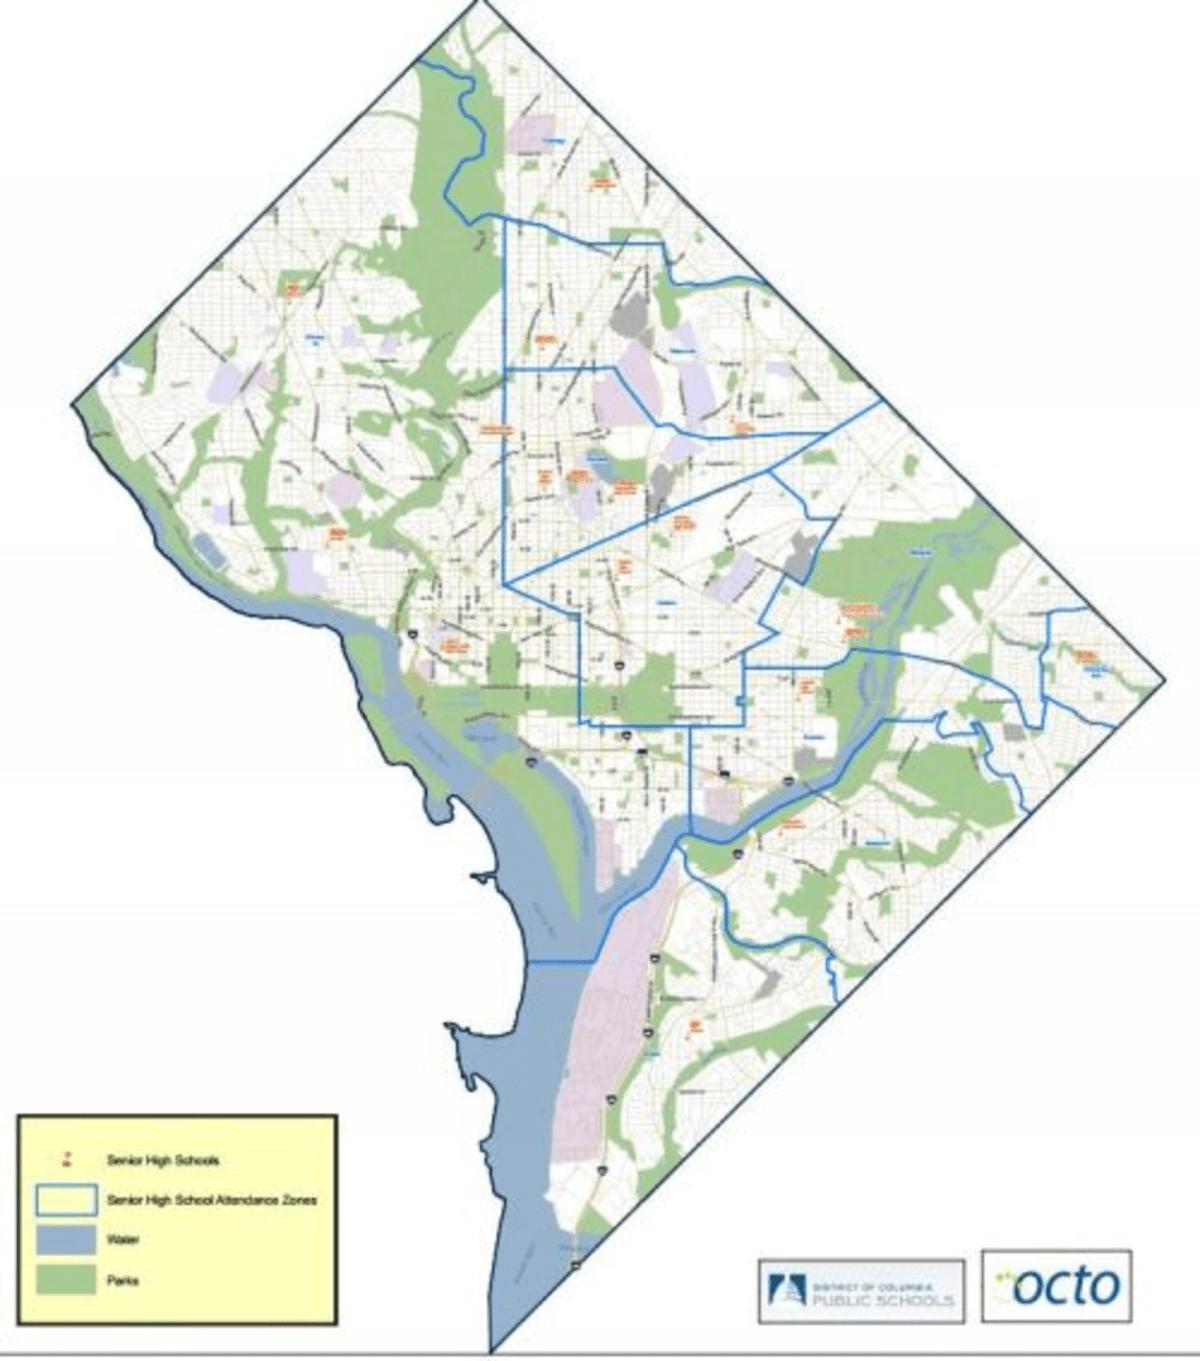 The existing high school boundaries.